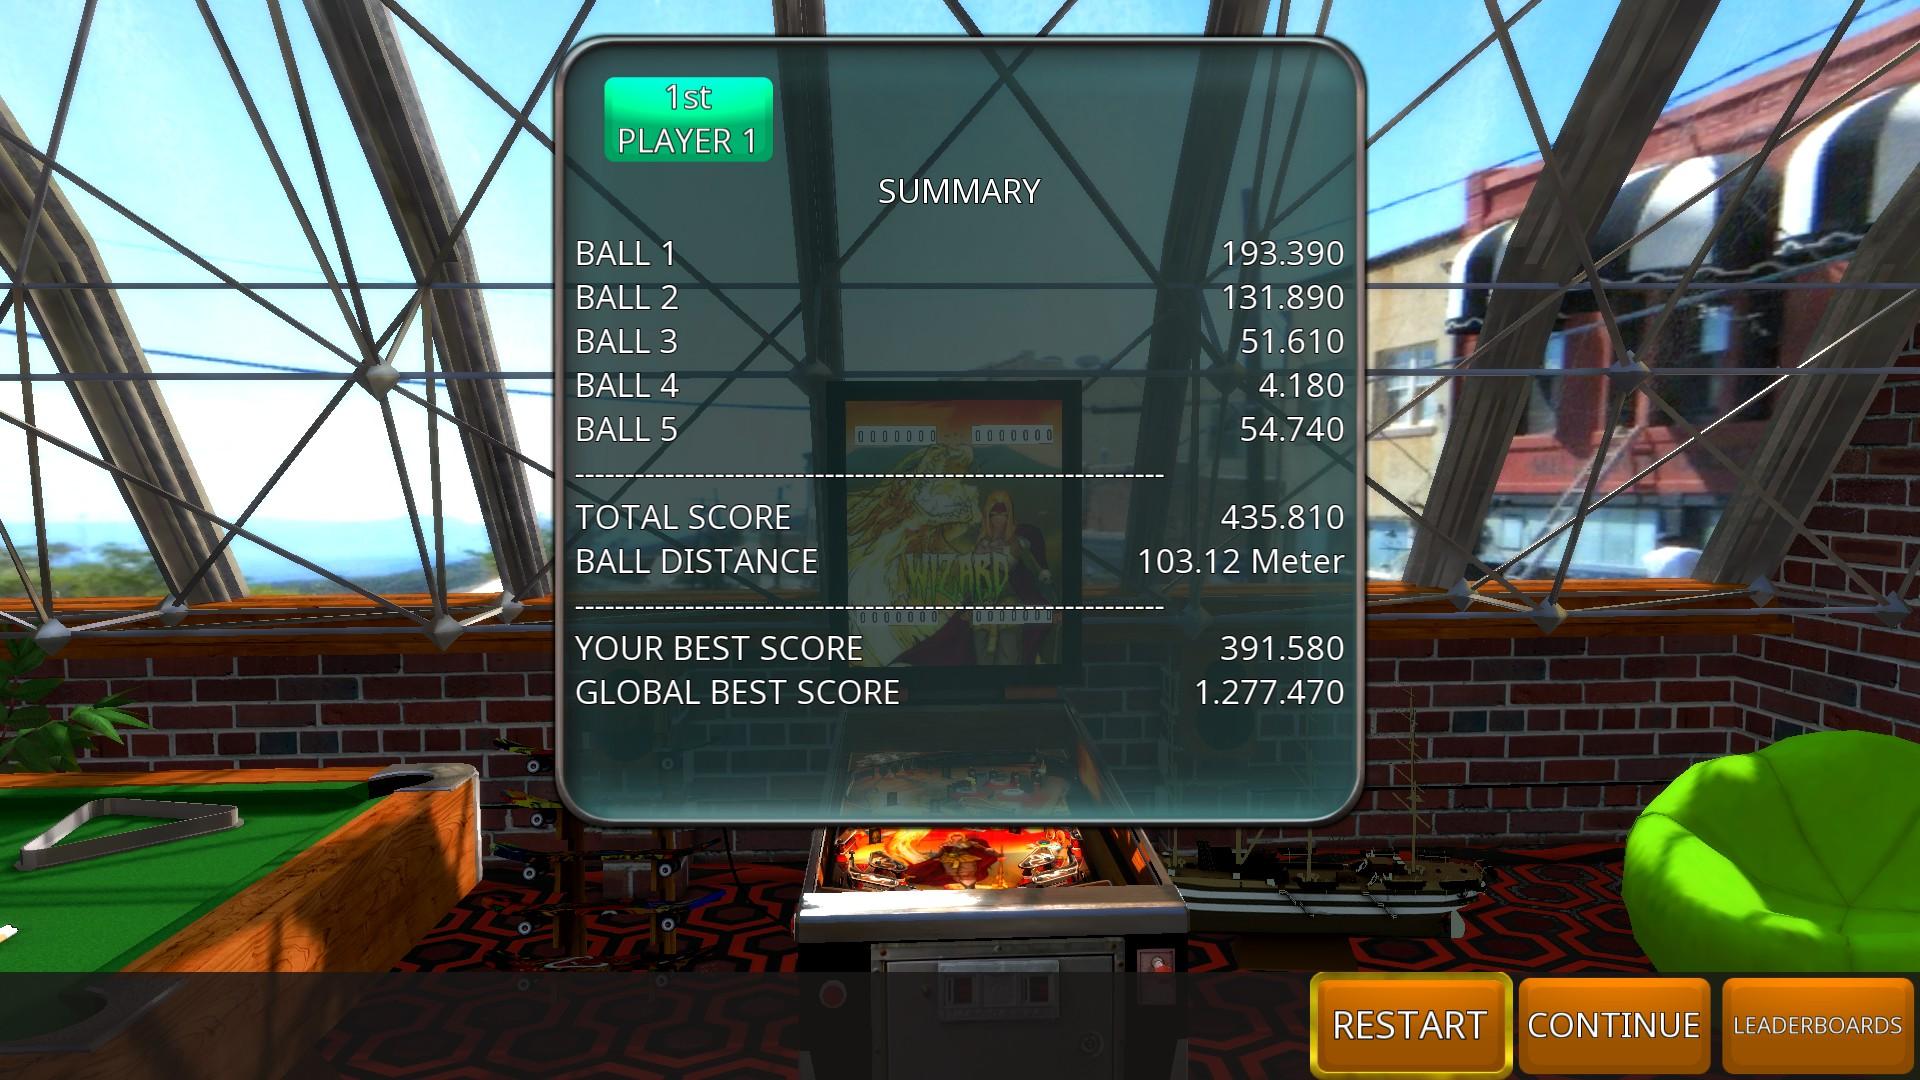 Mantalow: Zaccaria Pinball: Wizard [5 Balls] (PC) 435,810 points on 2018-05-22 01:33:48